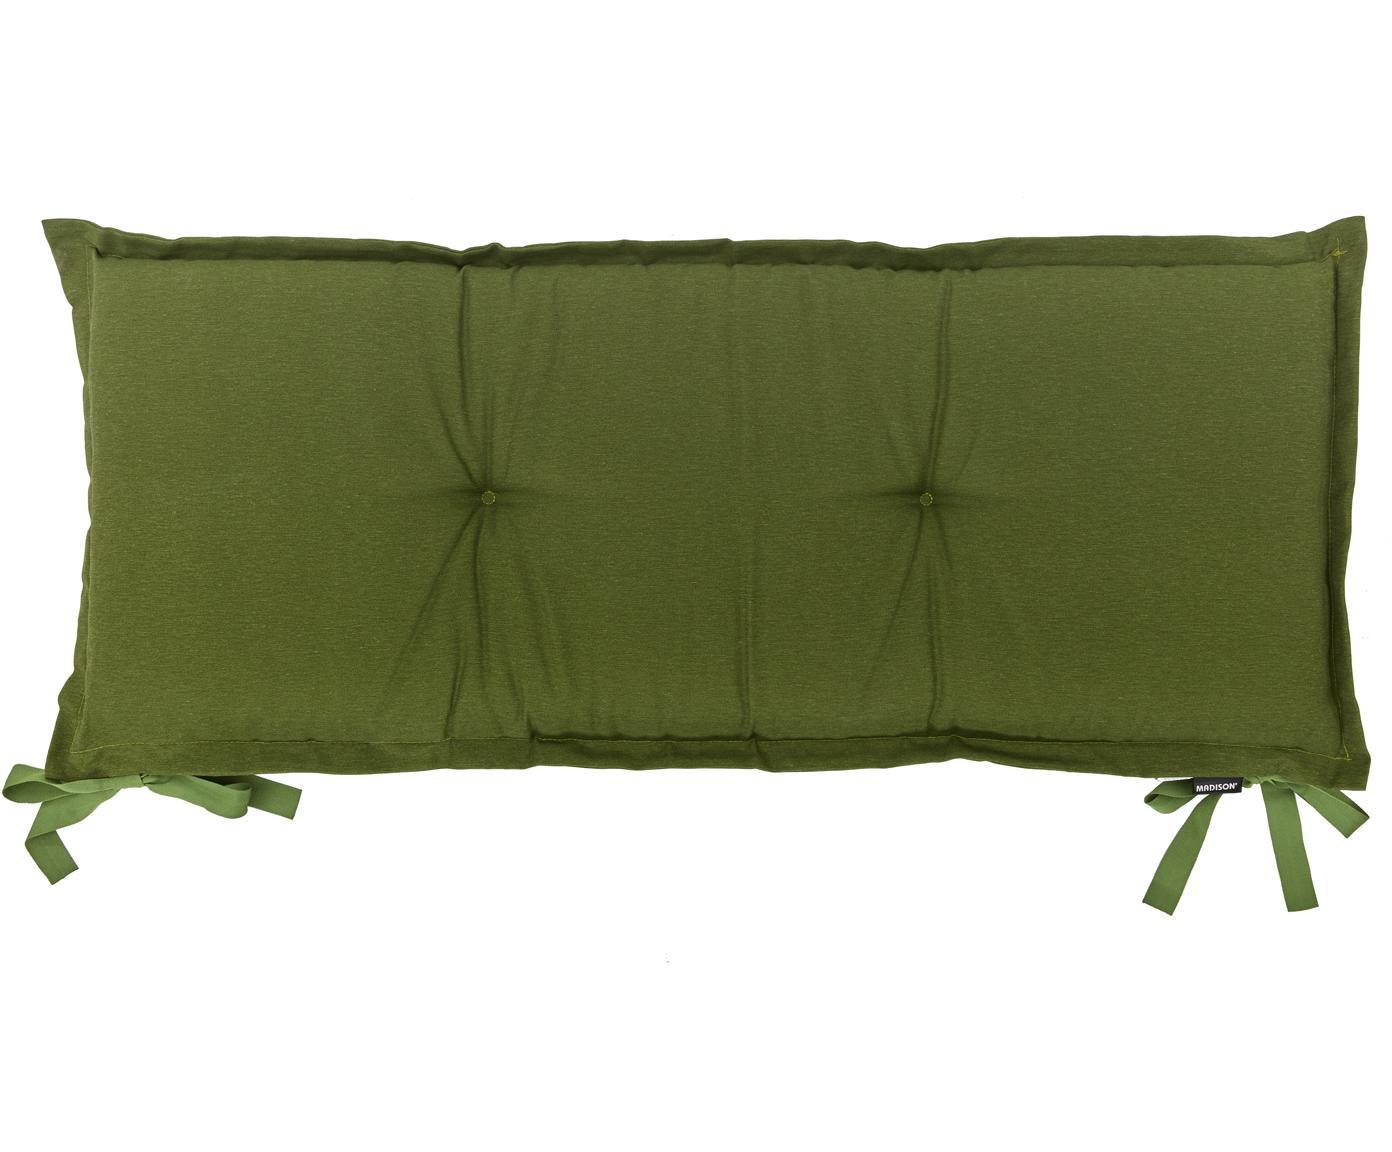 Cuscino sedia lungo Panama, 50% cotone, 45% poliestere, 5% altre fibre, Verde, Larg. 48 x Lung. 120 cm